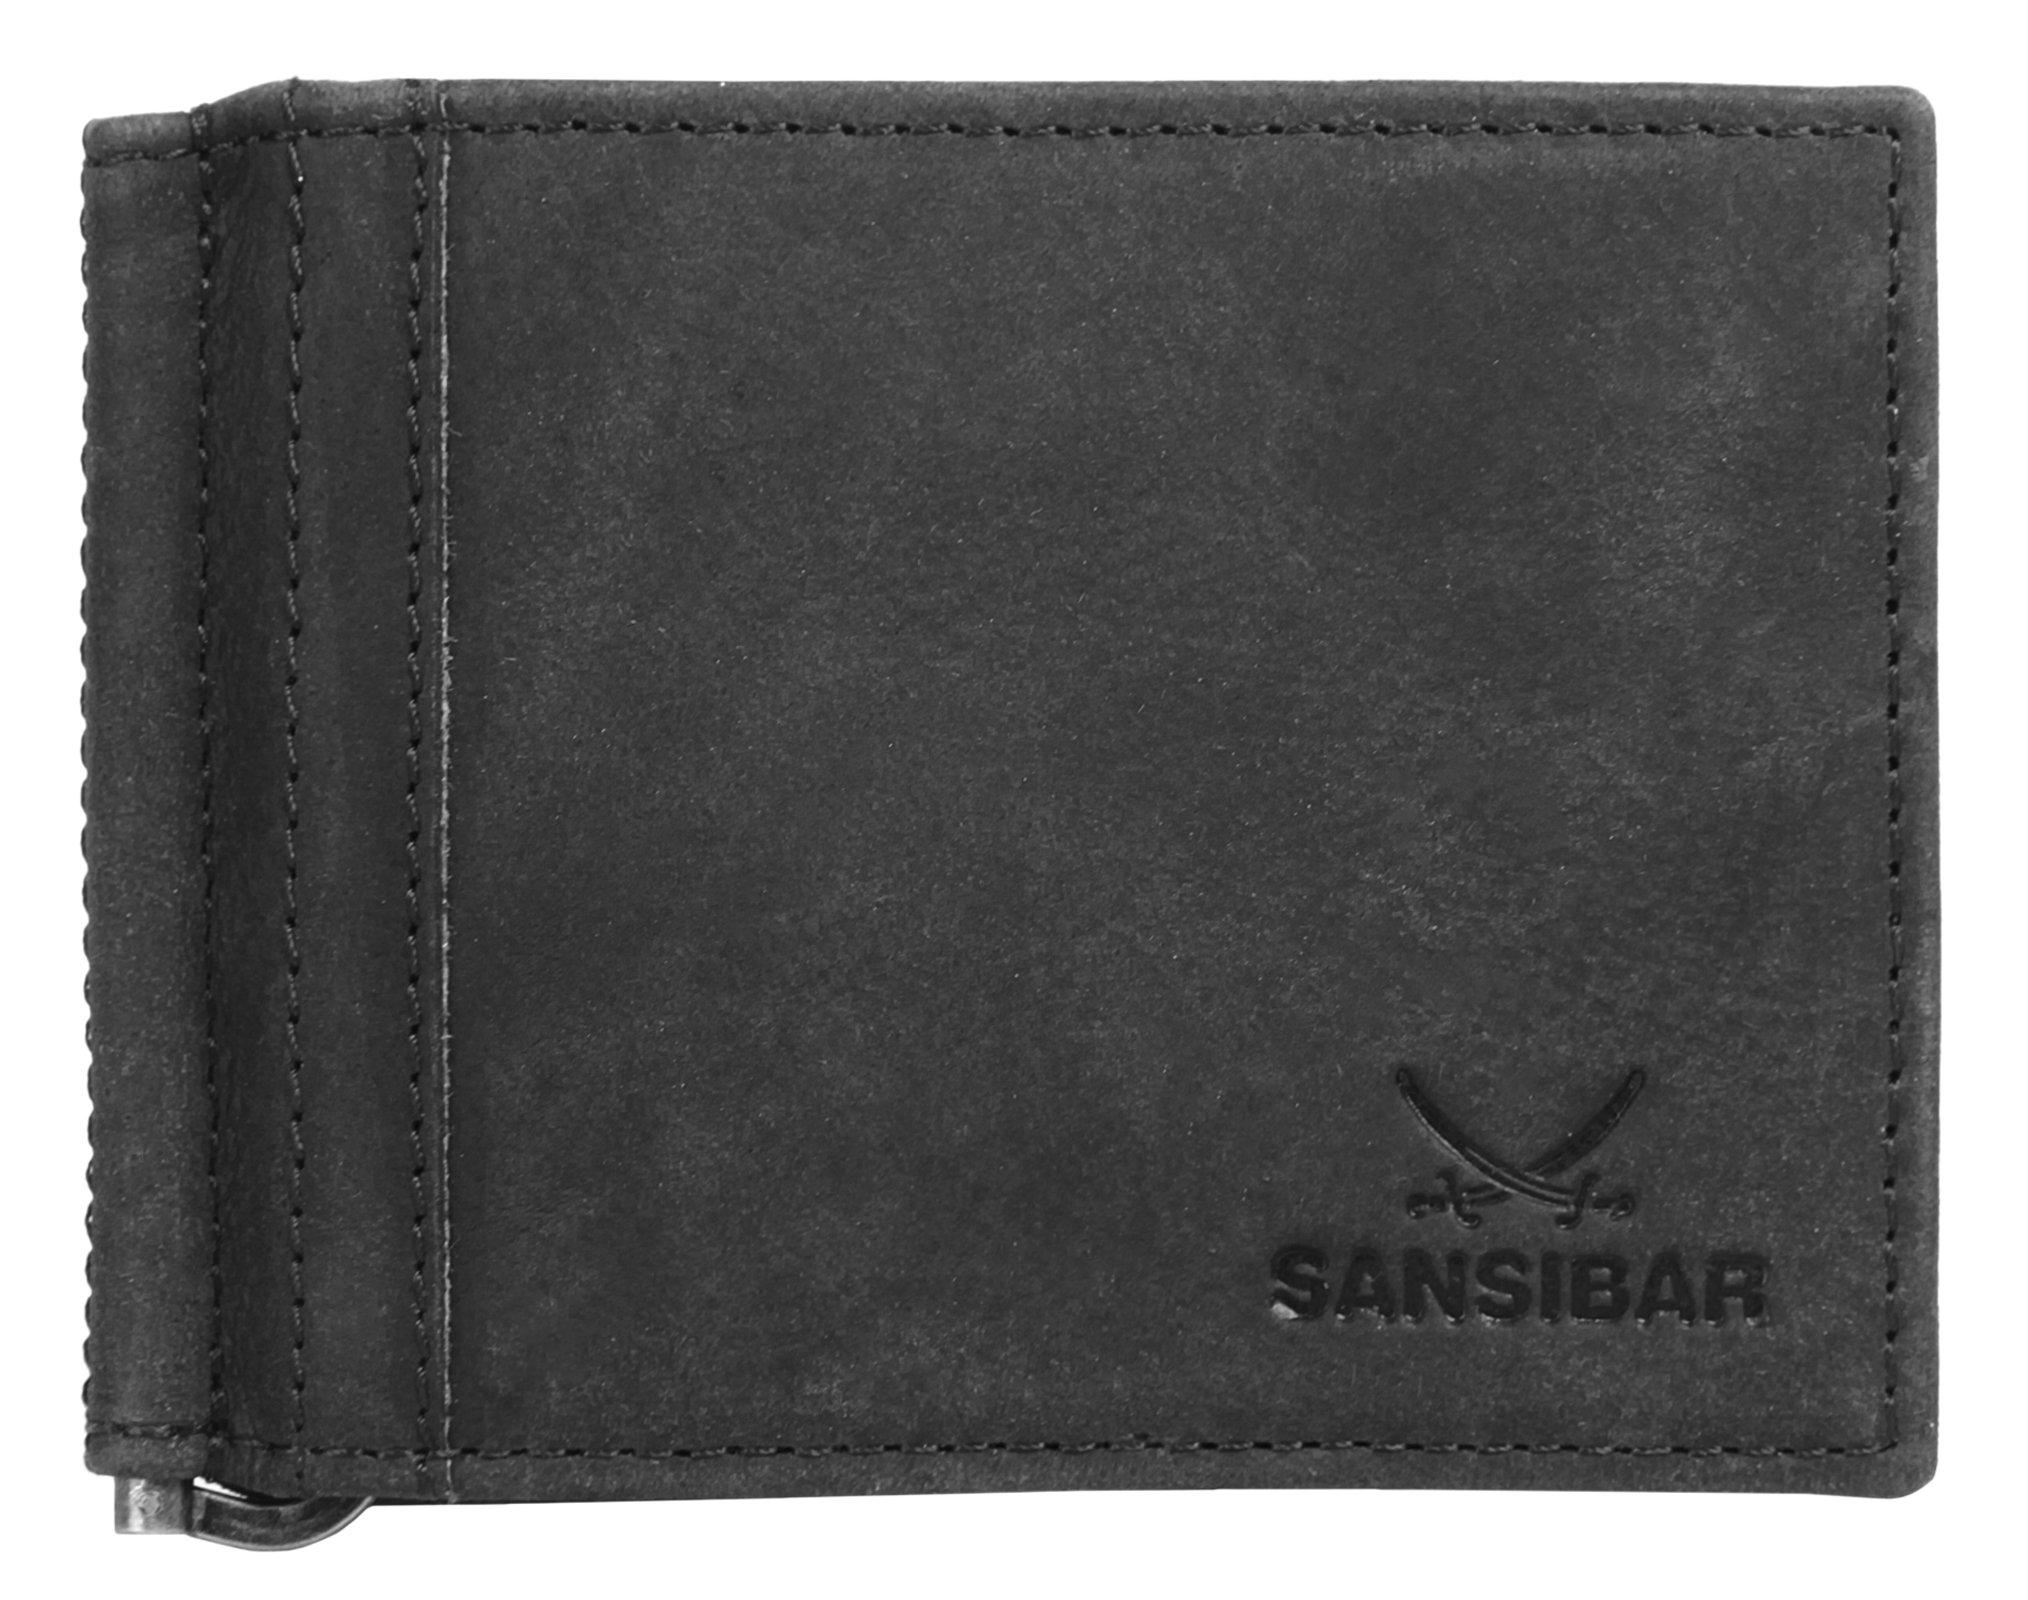 Sansibar portemonnee - gratis ruilen op otto.nl